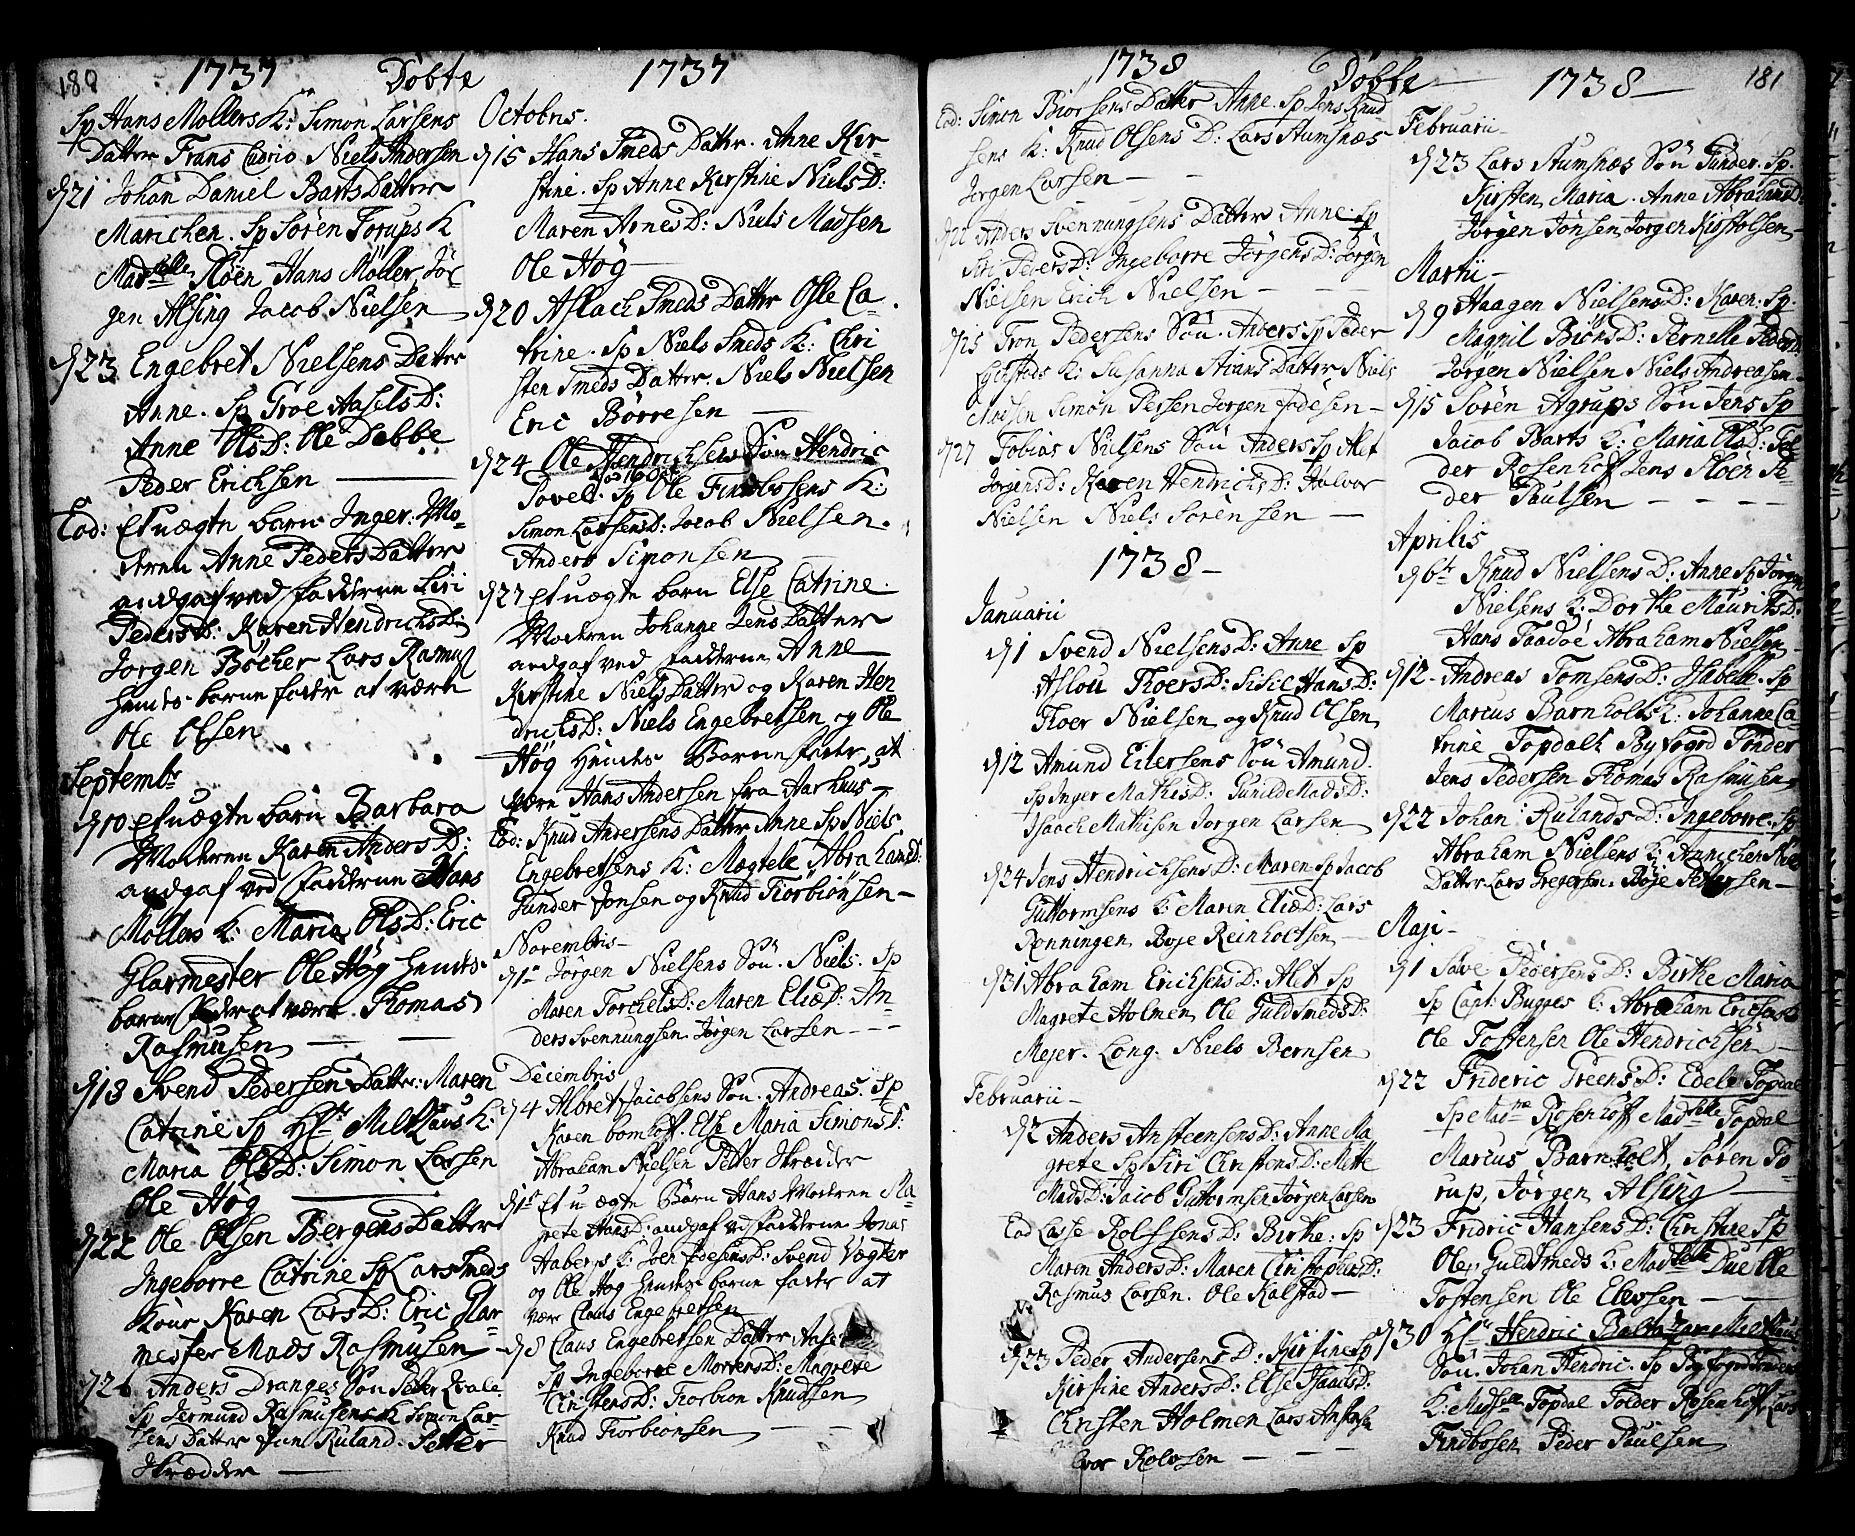 SAKO, Kragerø kirkebøker, F/Fa/L0001: Ministerialbok nr. 1, 1702-1766, s. 180-181